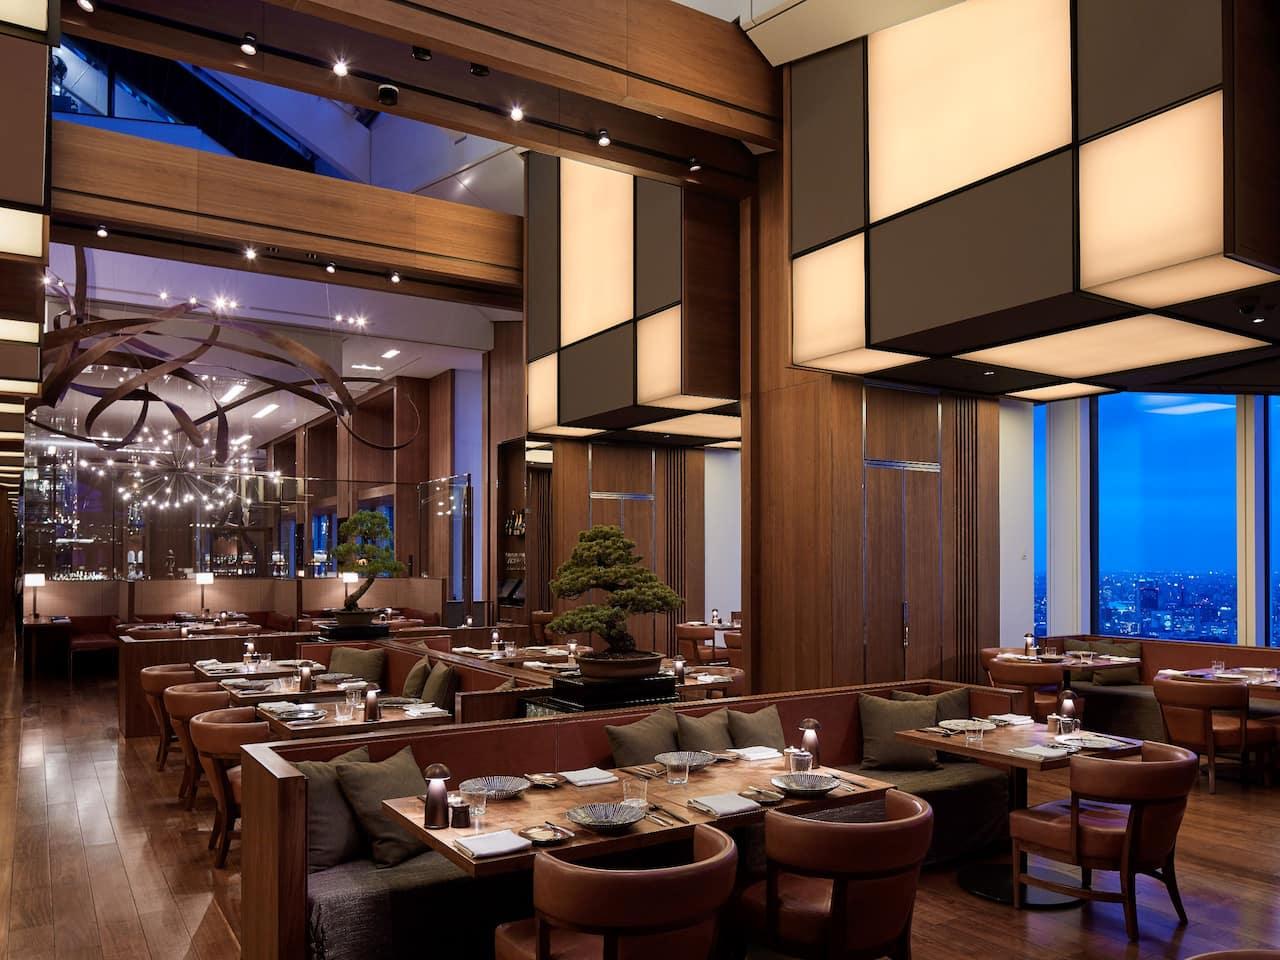 Andaz Tokyo Toranomon Hills, The Tavern - Grill & Lounge